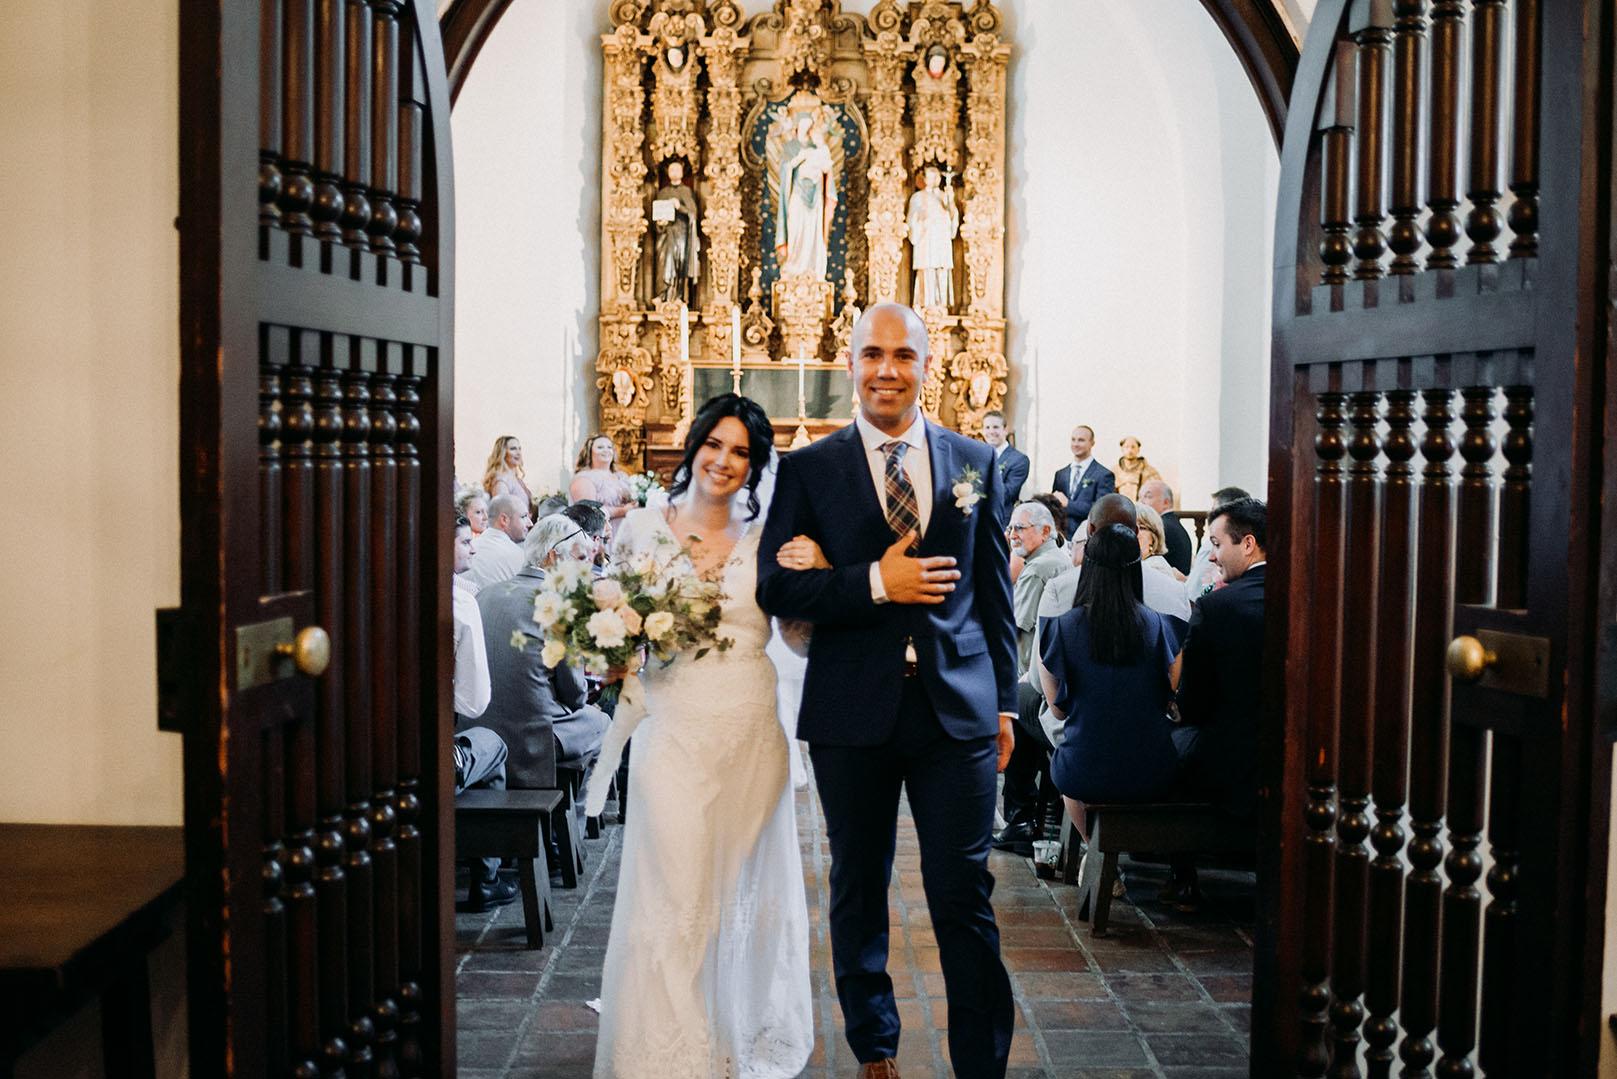 San Diego Wedding Photography | Corbin and Sam